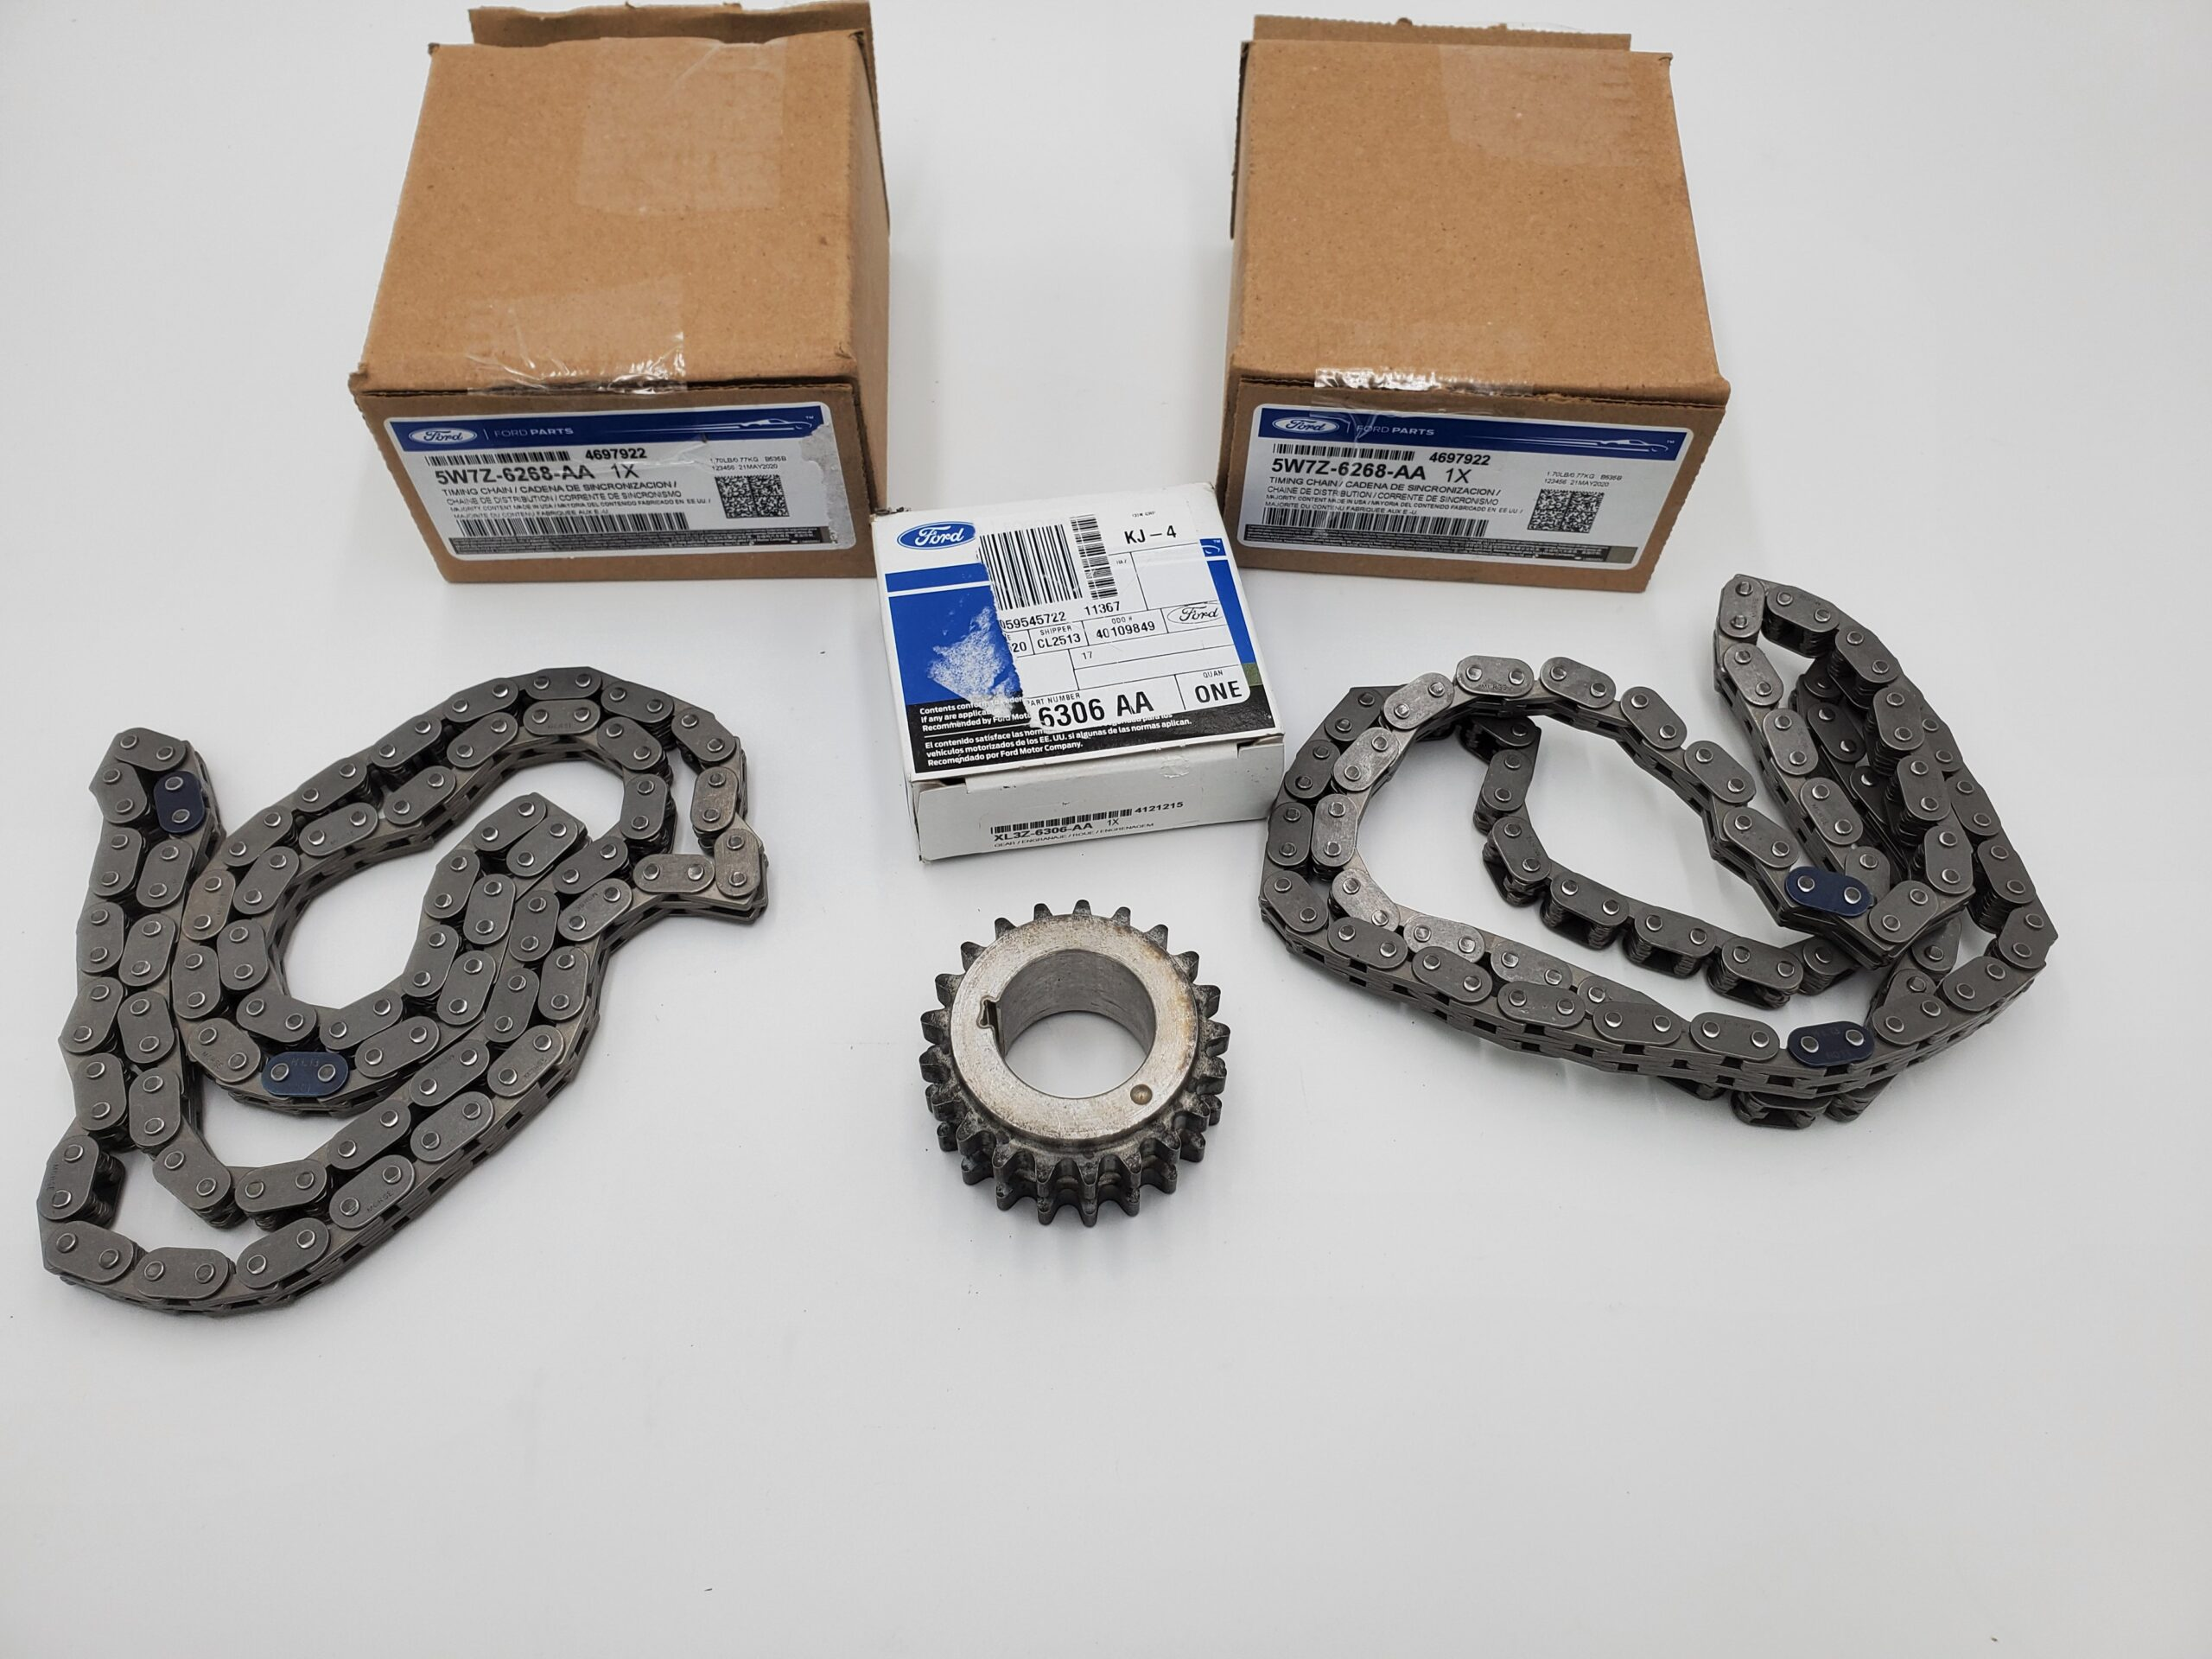 Brand New OEM Chain – Timing and Gear – Crankshaft 5.4 L V8, 3 Pieces Engine Repair Kit (OG-60-5.4L-3-2)